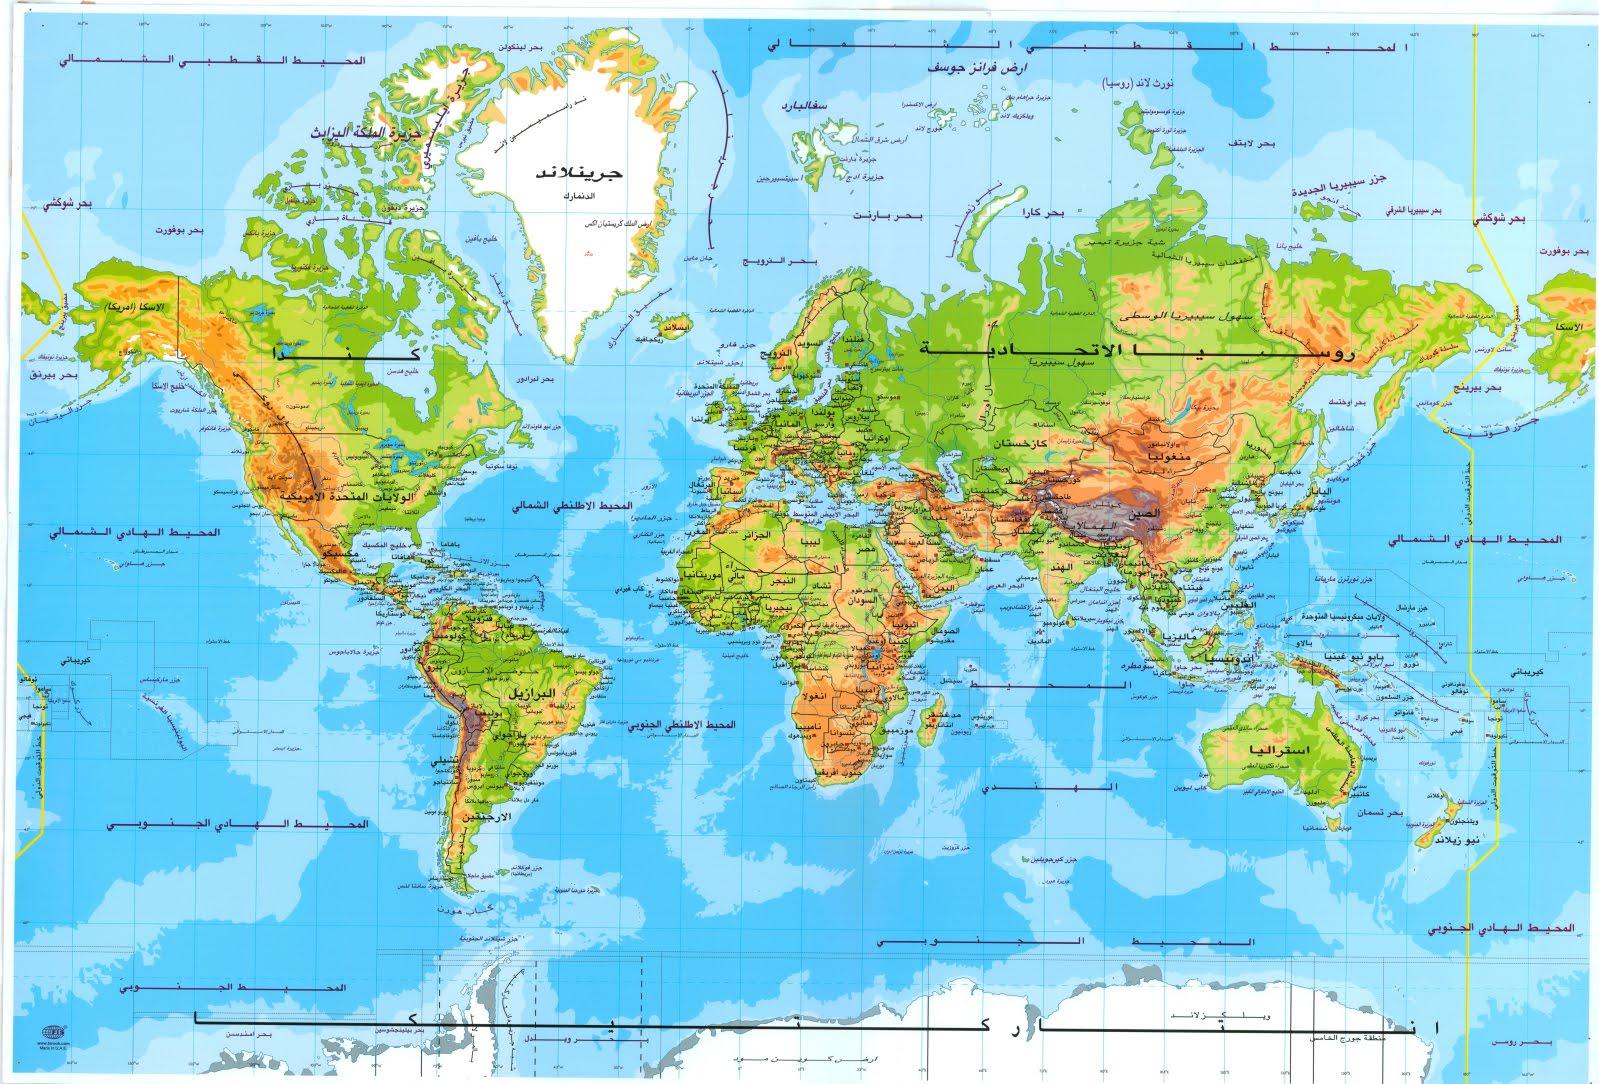 خريطة العالم خريطة العالم